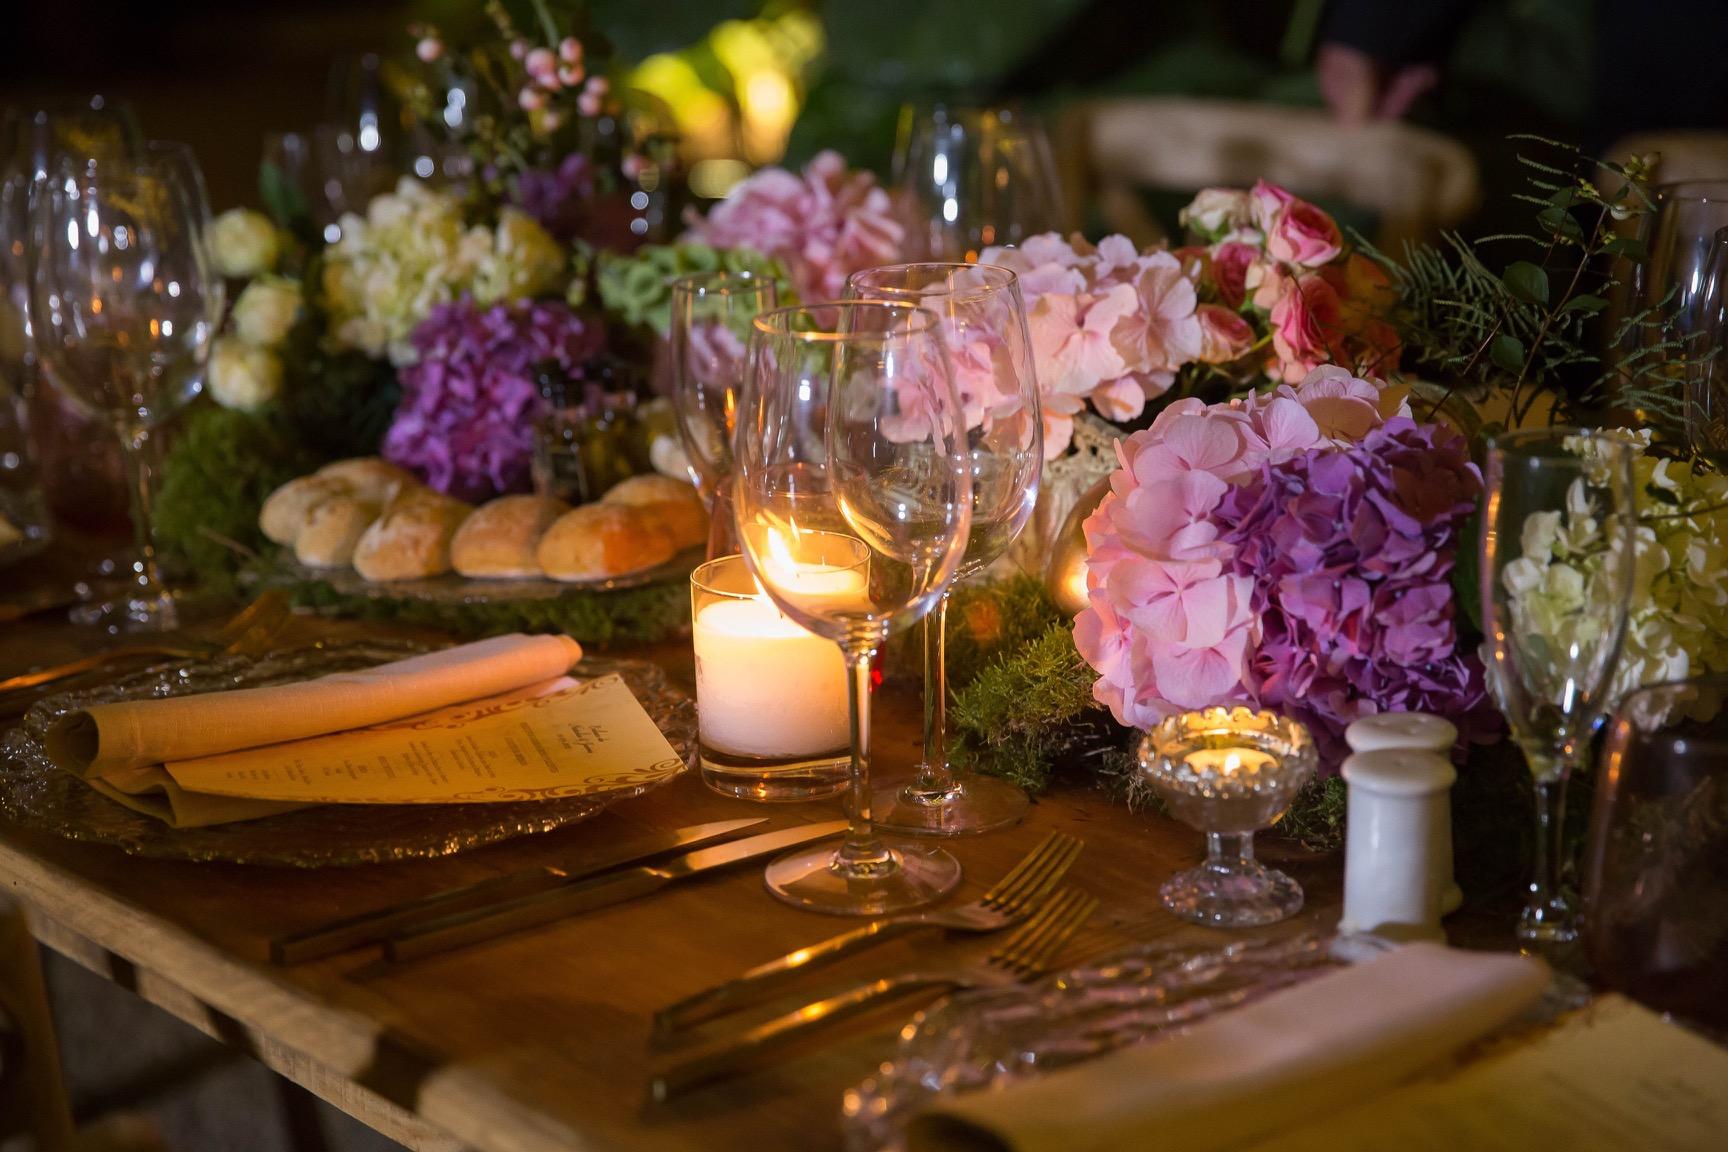 Si-Quiero-Wedding-Planner-By-Sira-Antequera-Bodas-Málaga-Marbella-Miami Natalia-Jaime-10